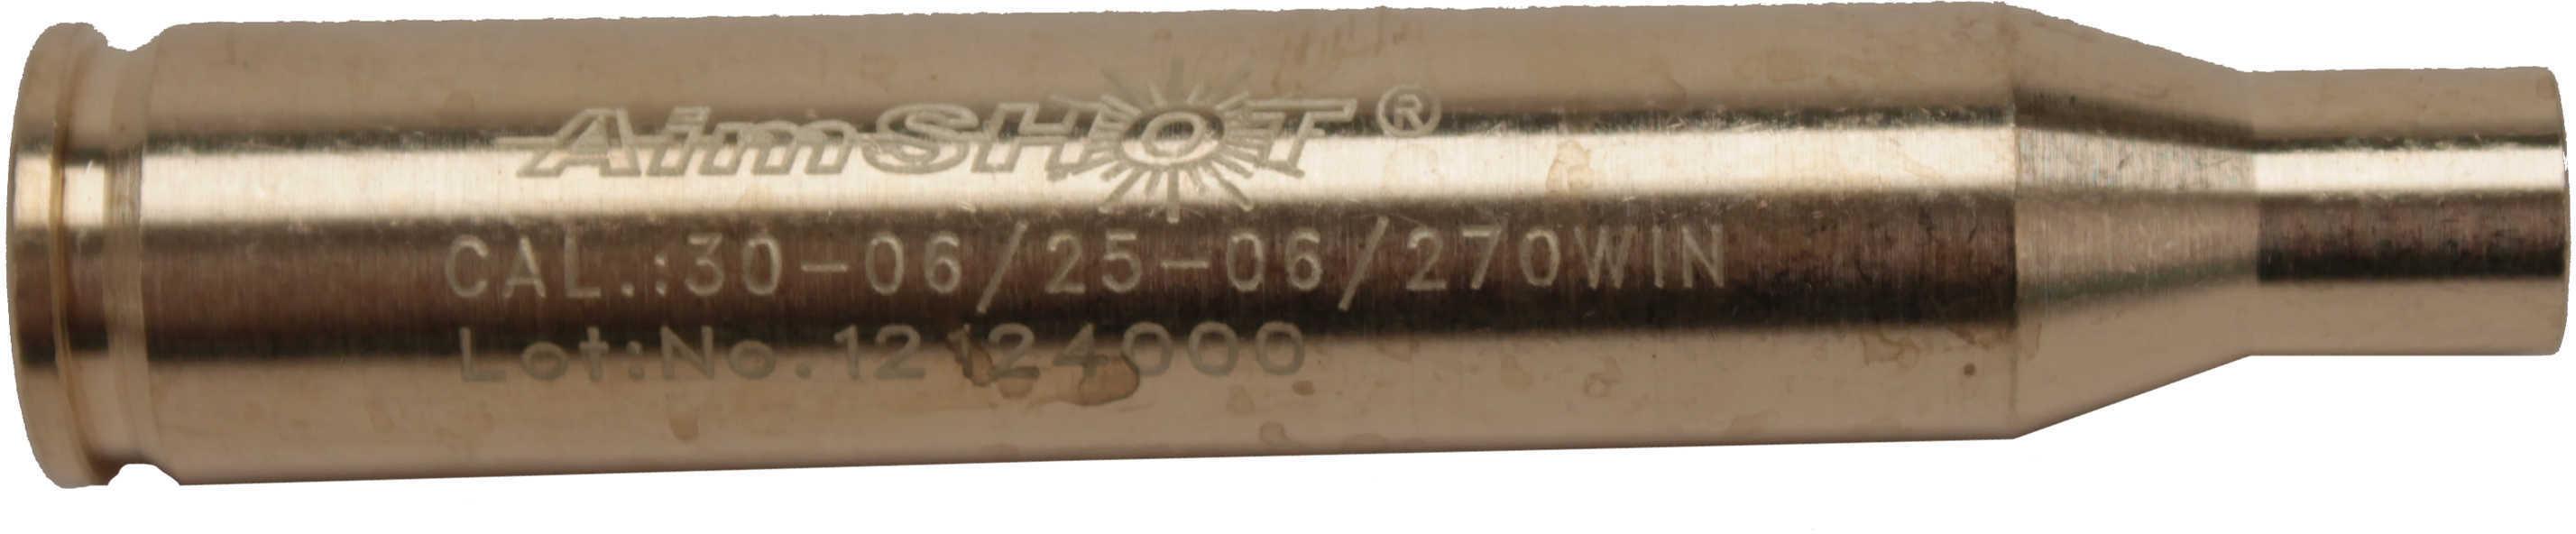 Aimshot AR3006 Arbor Laser Boresights